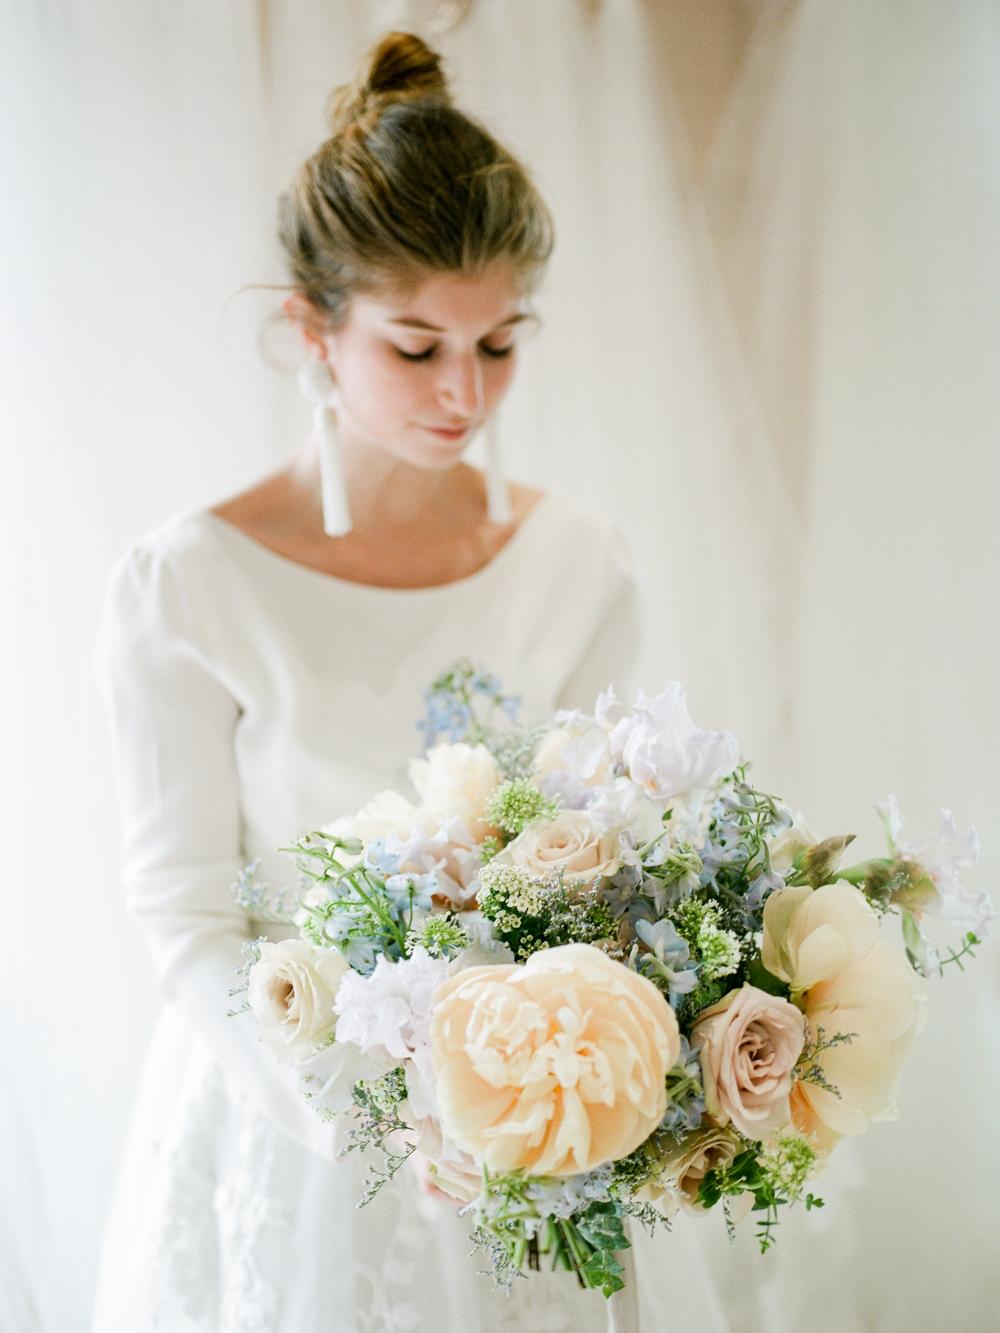 Christine Gosch - destination film photographer - houston wedding photographer - fine art film photographer - elopement photographer - destination wedding - understated wedding - simple beautiful wedding photography-19.jpg